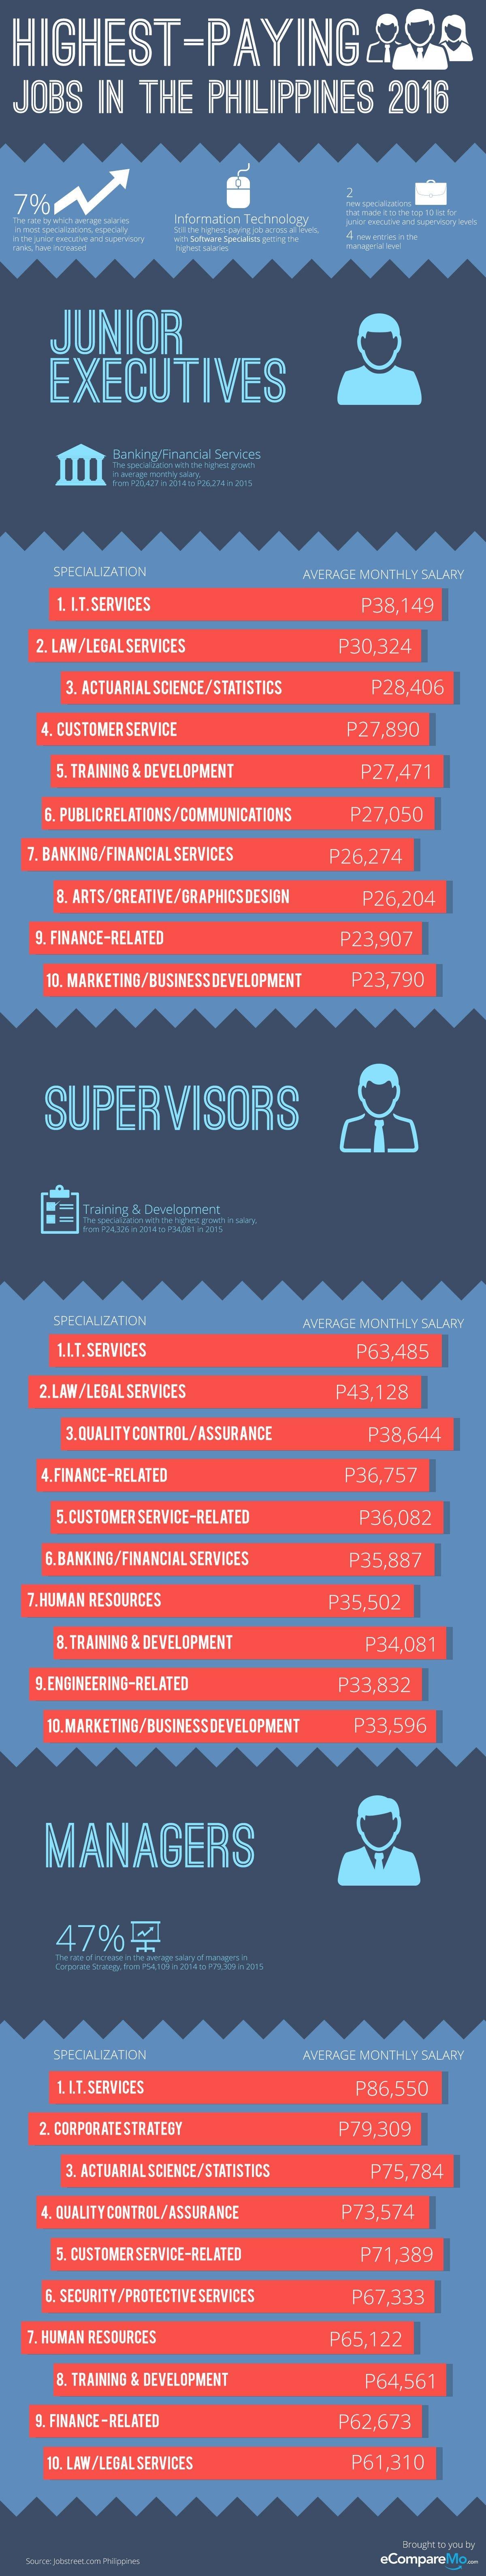 Infographic-Top-job-and-salaries-2016-V2